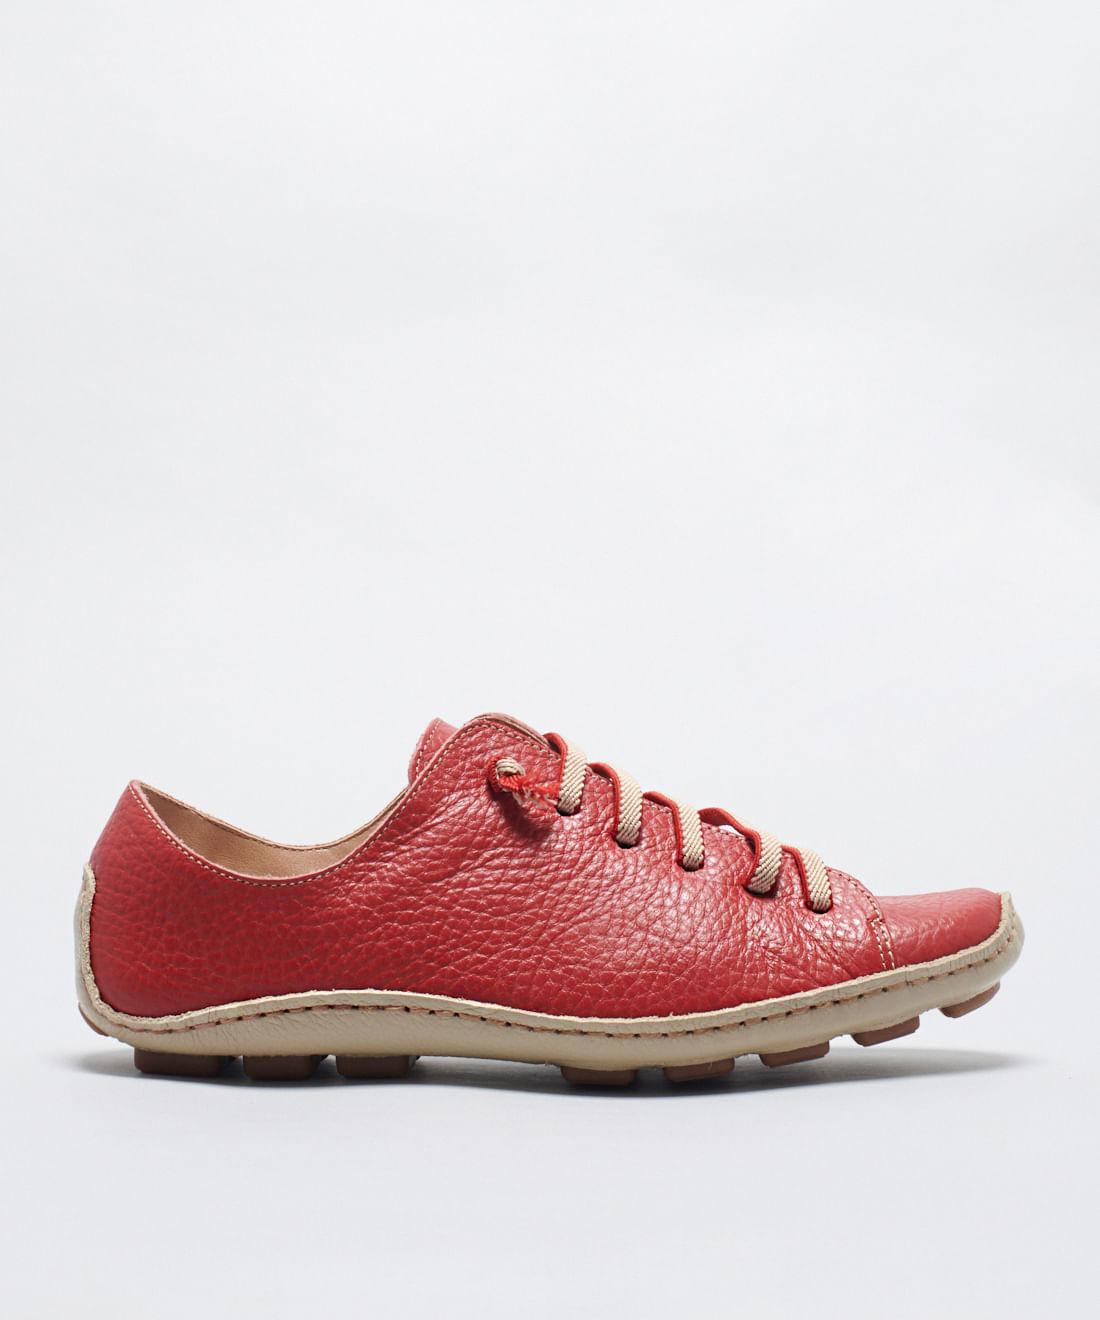 Tênis Comfort Croma - Vermelho